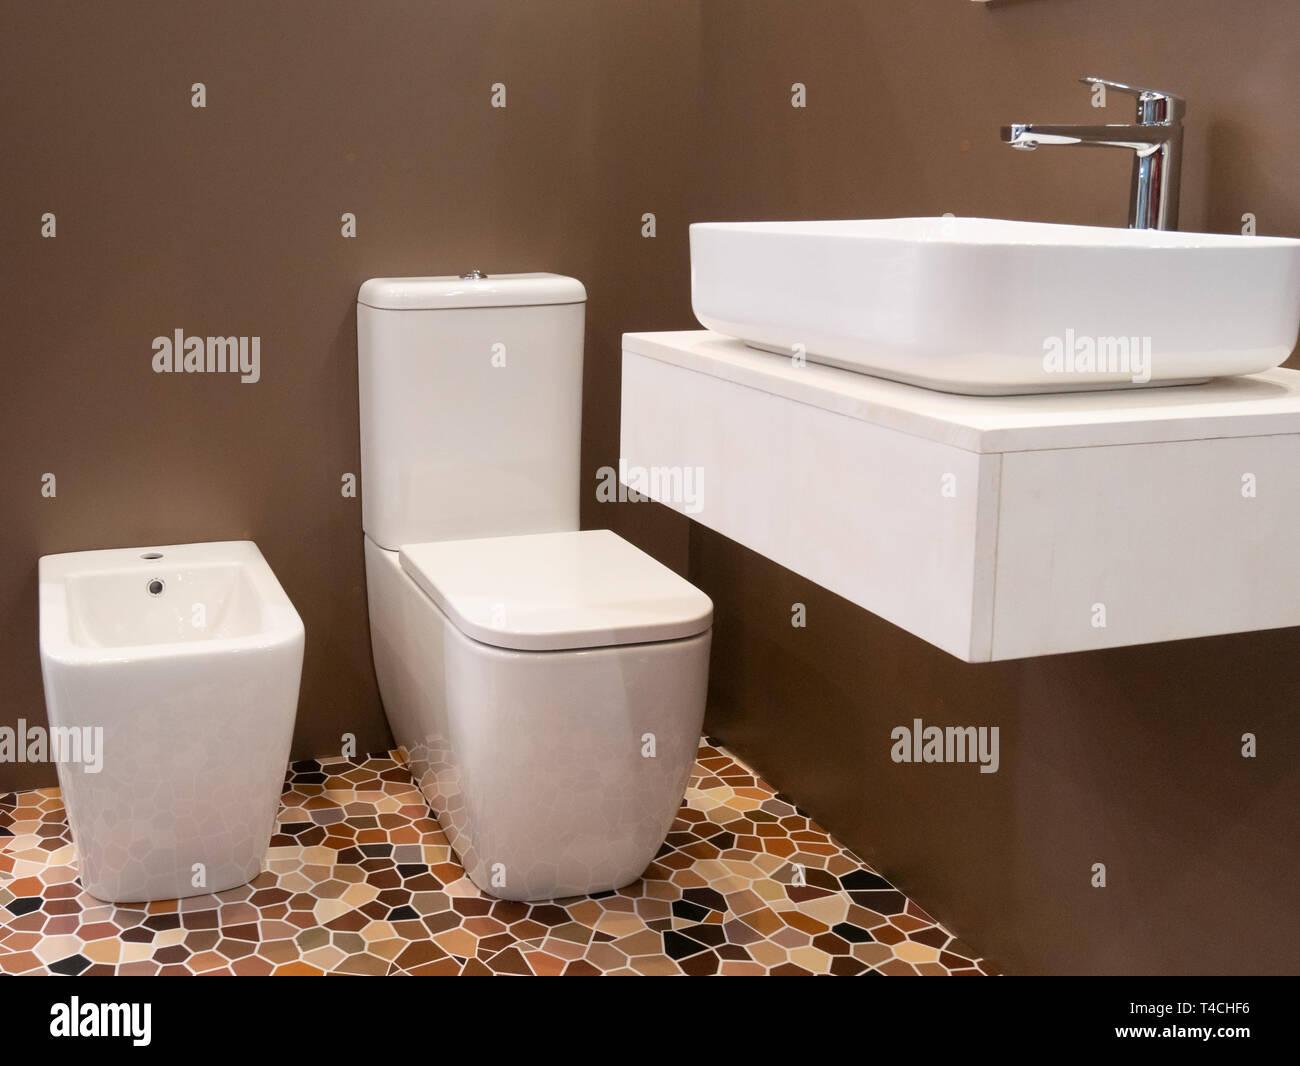 Modern Interior Design Of Hotel Bathroom With Washbasin Toilet And Bidet Stock Photo Alamy